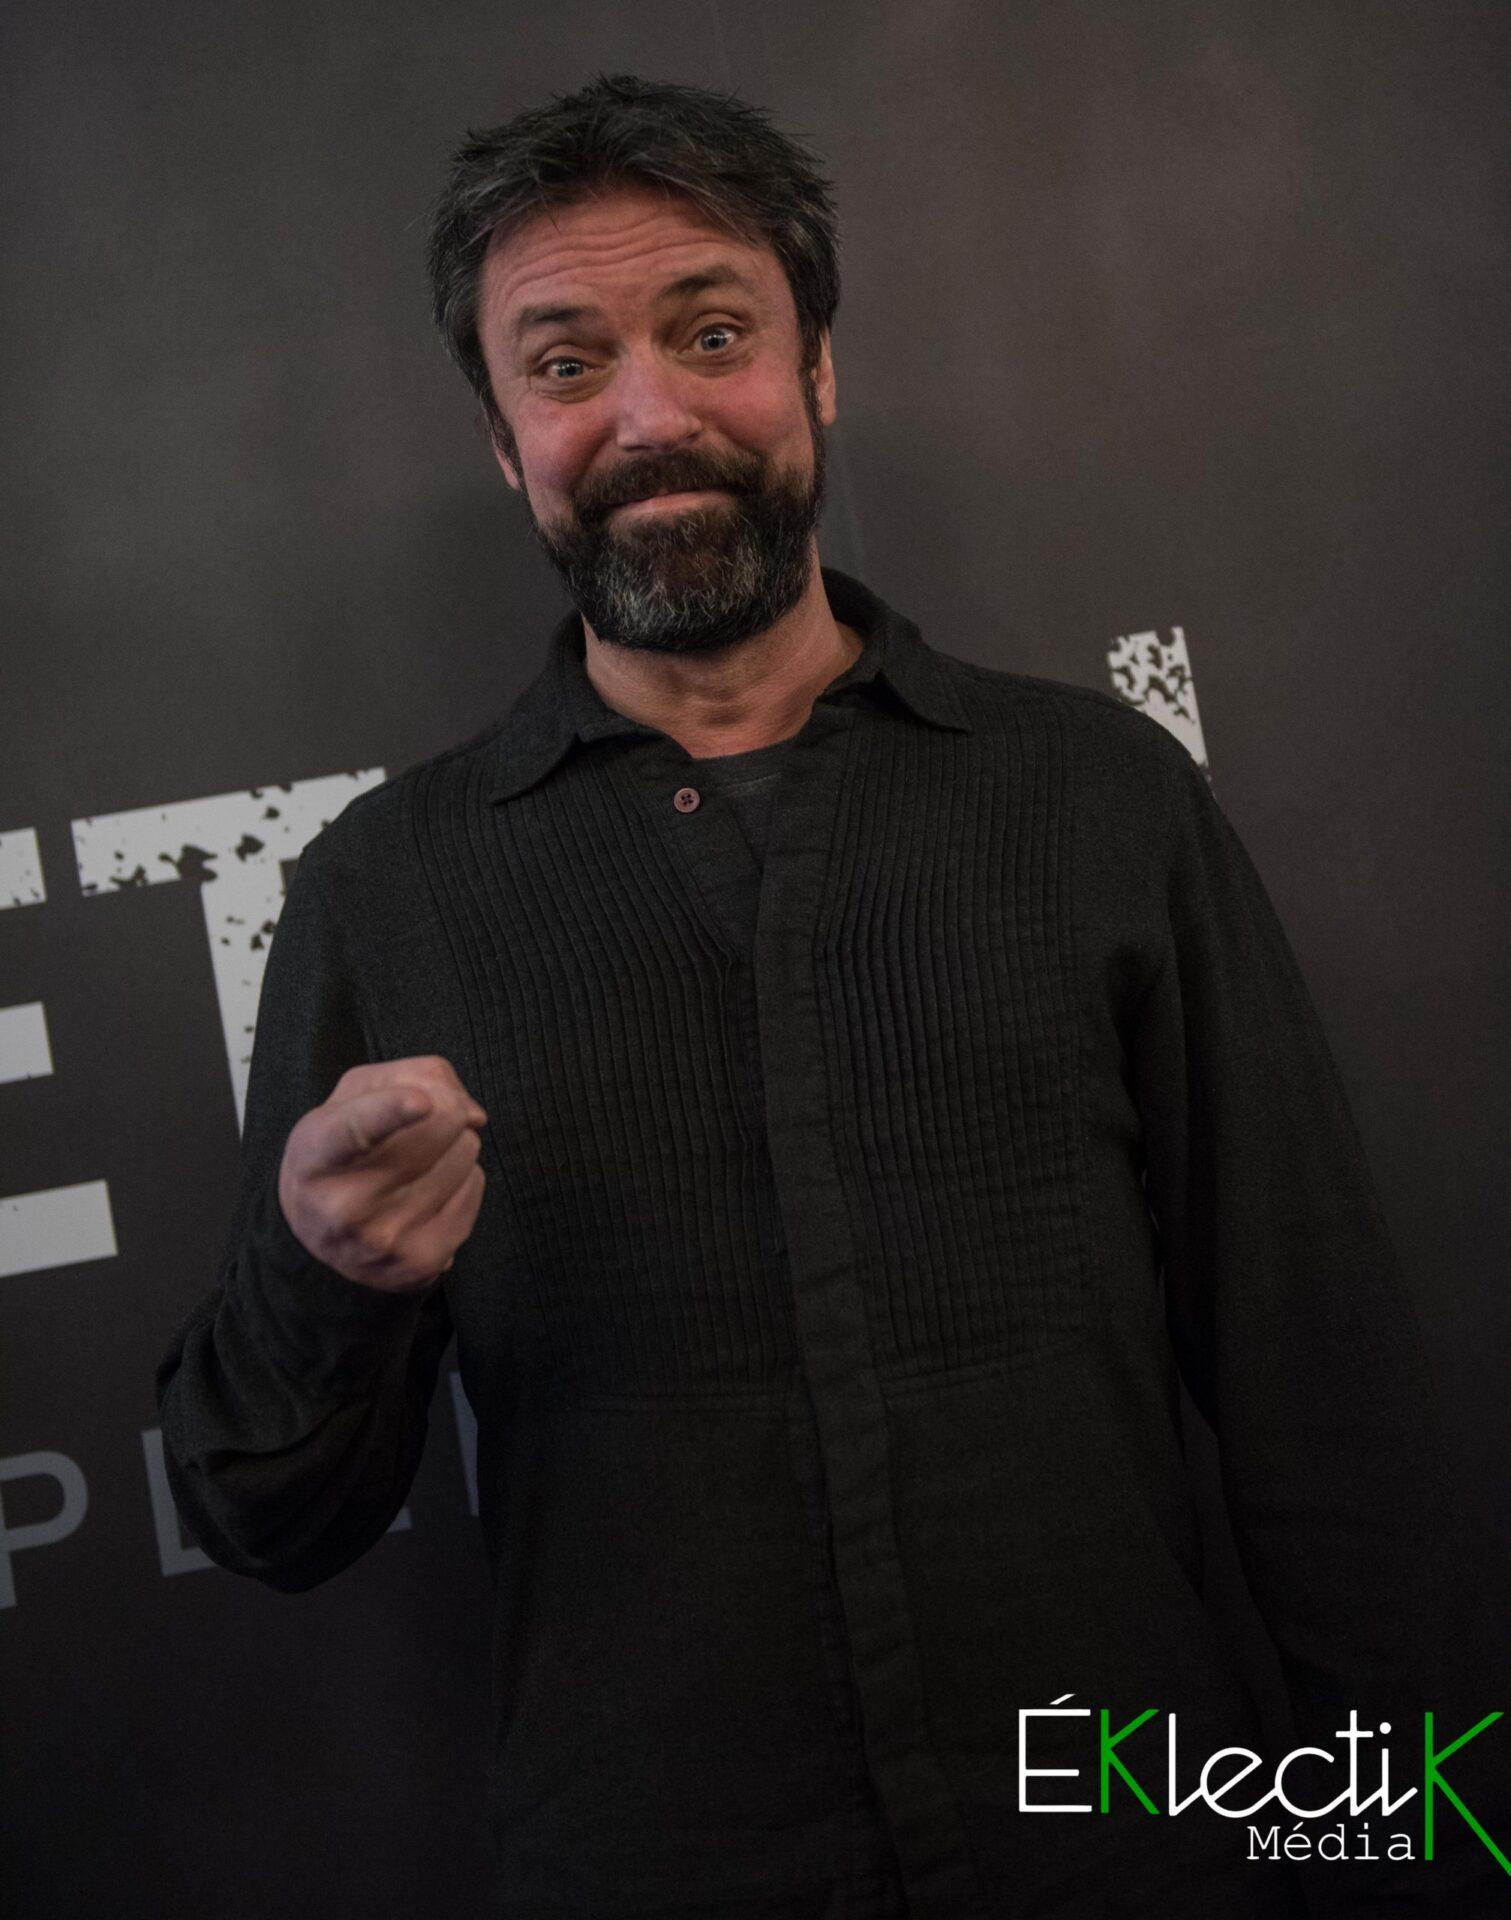 Jean-Marie Corbeil